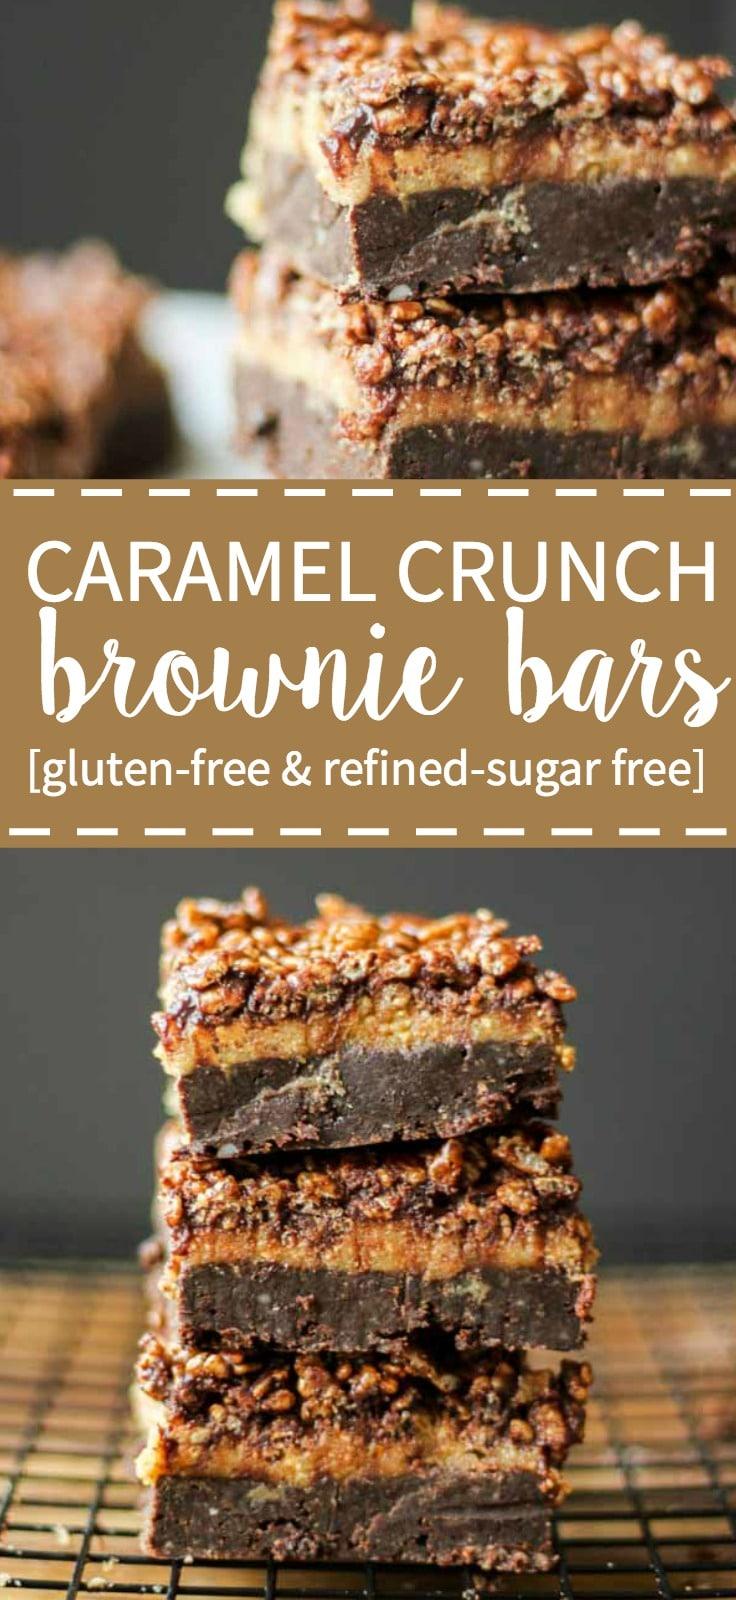 caramel-crunch-brownie-bars